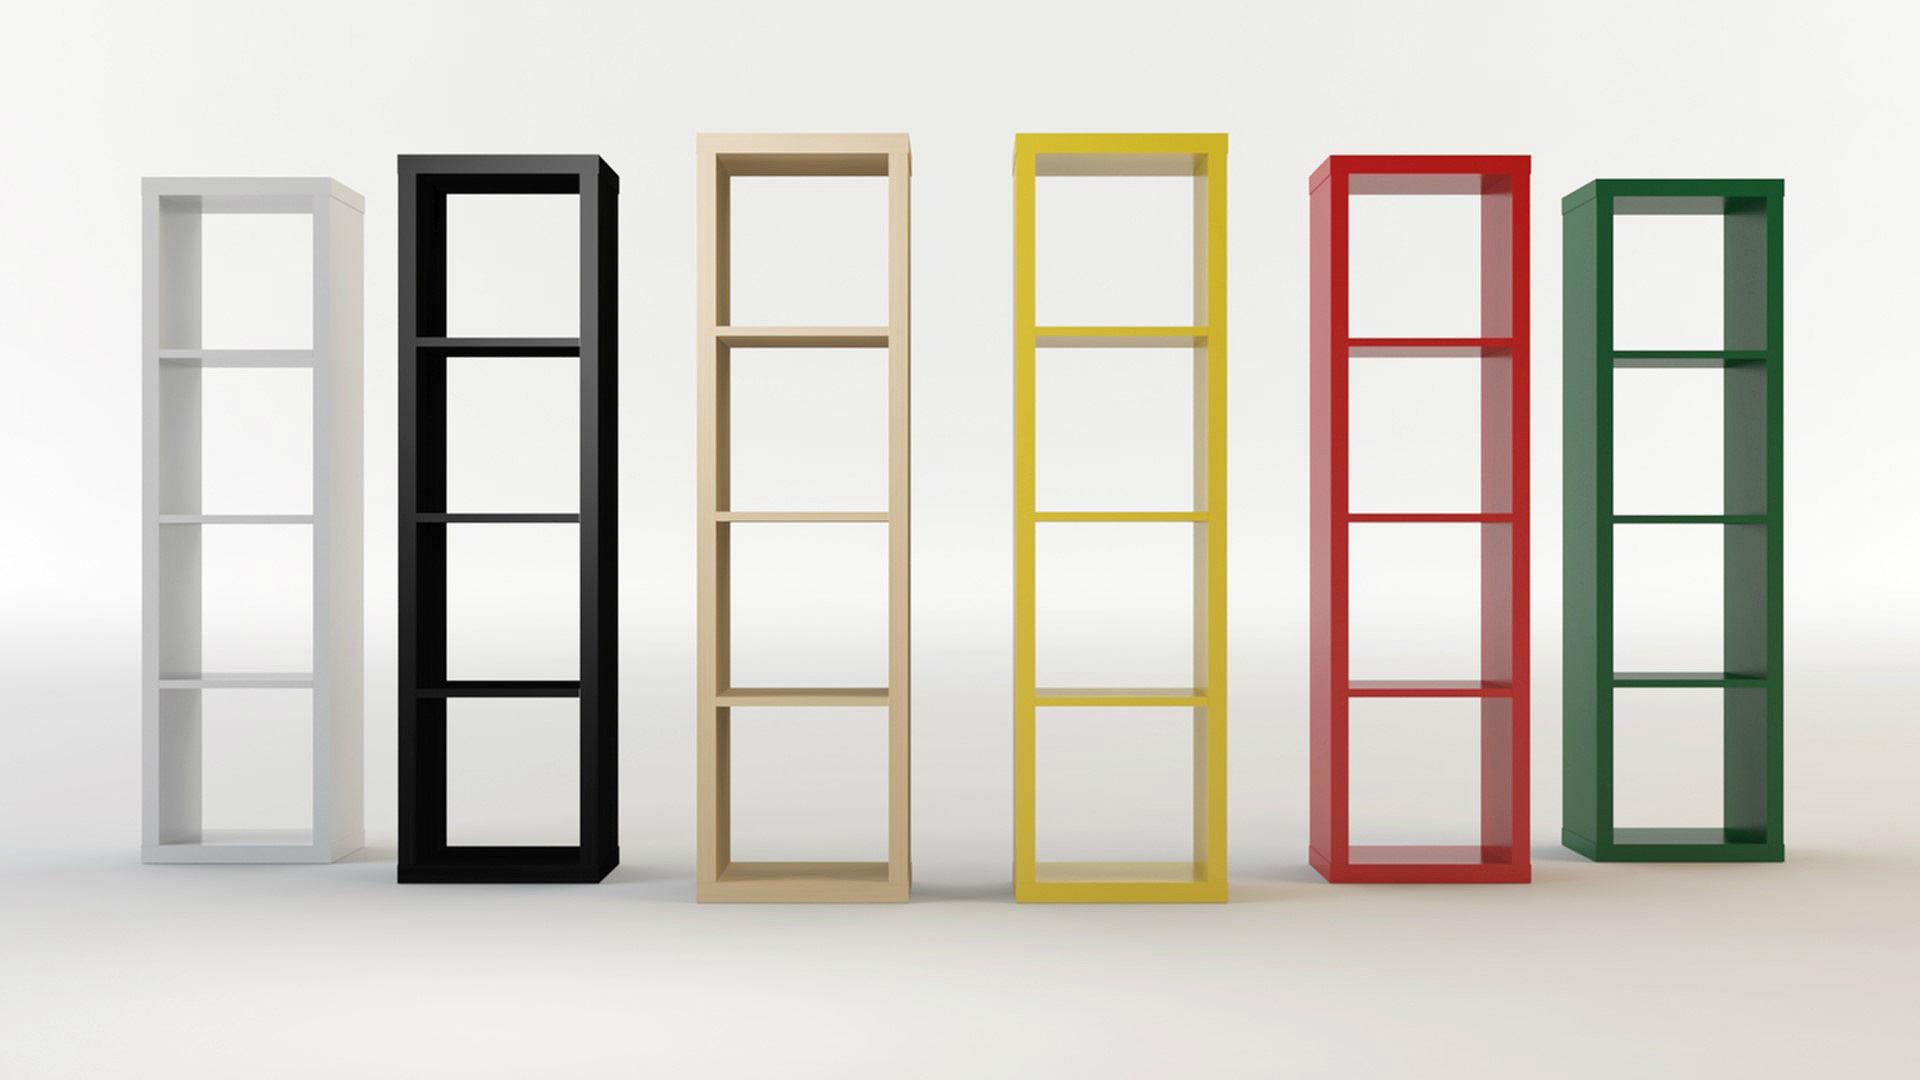 ikea kallax shelves by s i s c o 3docean. Black Bedroom Furniture Sets. Home Design Ideas